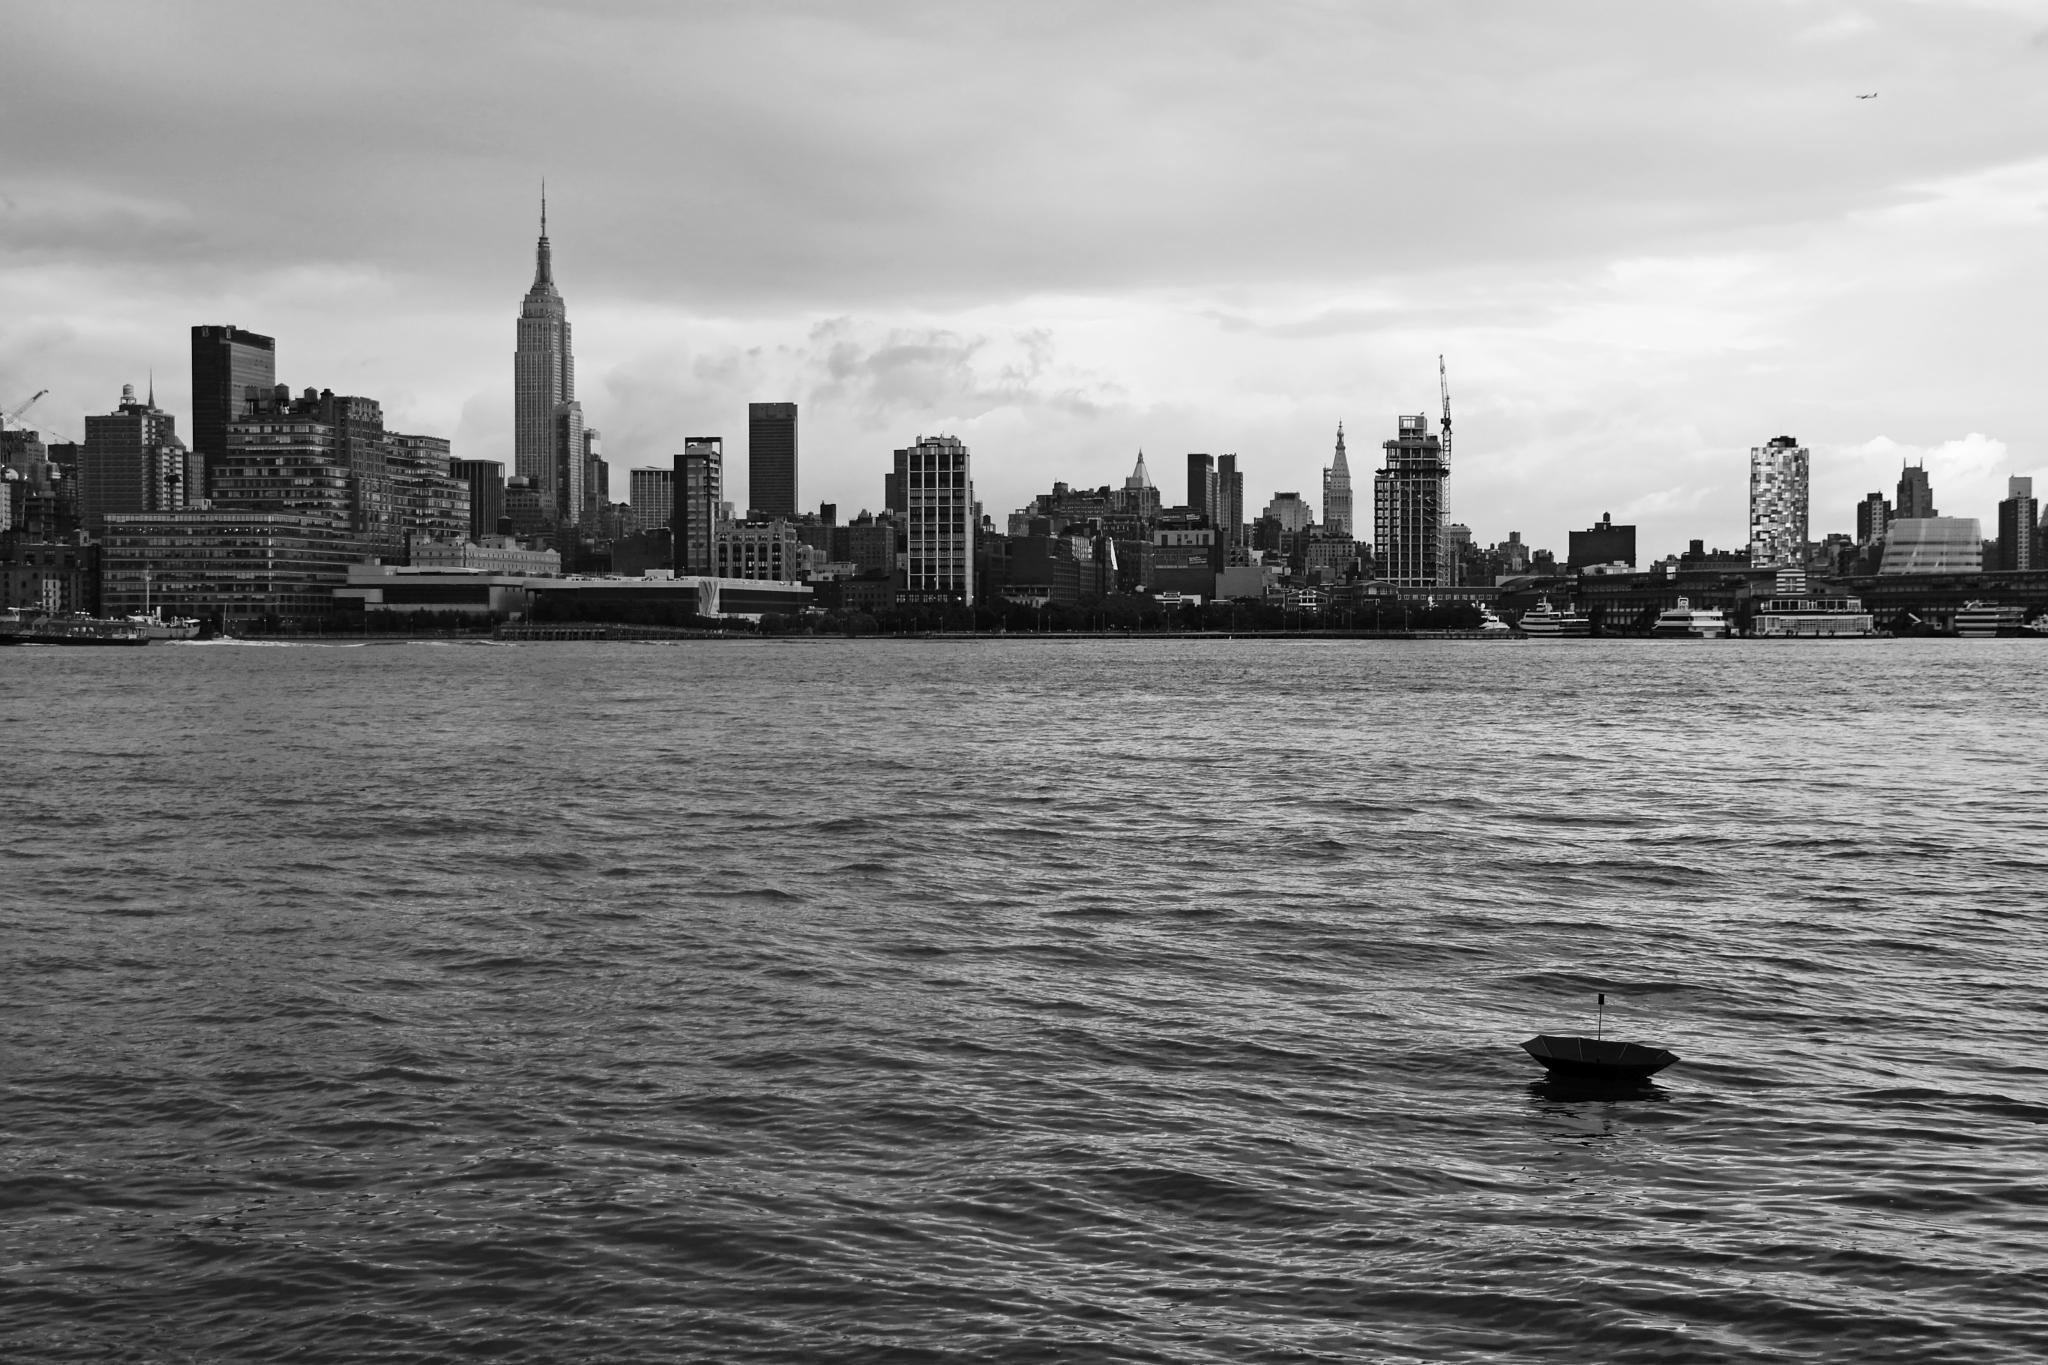 New York New York - Lost Umbrella by visbimmer79